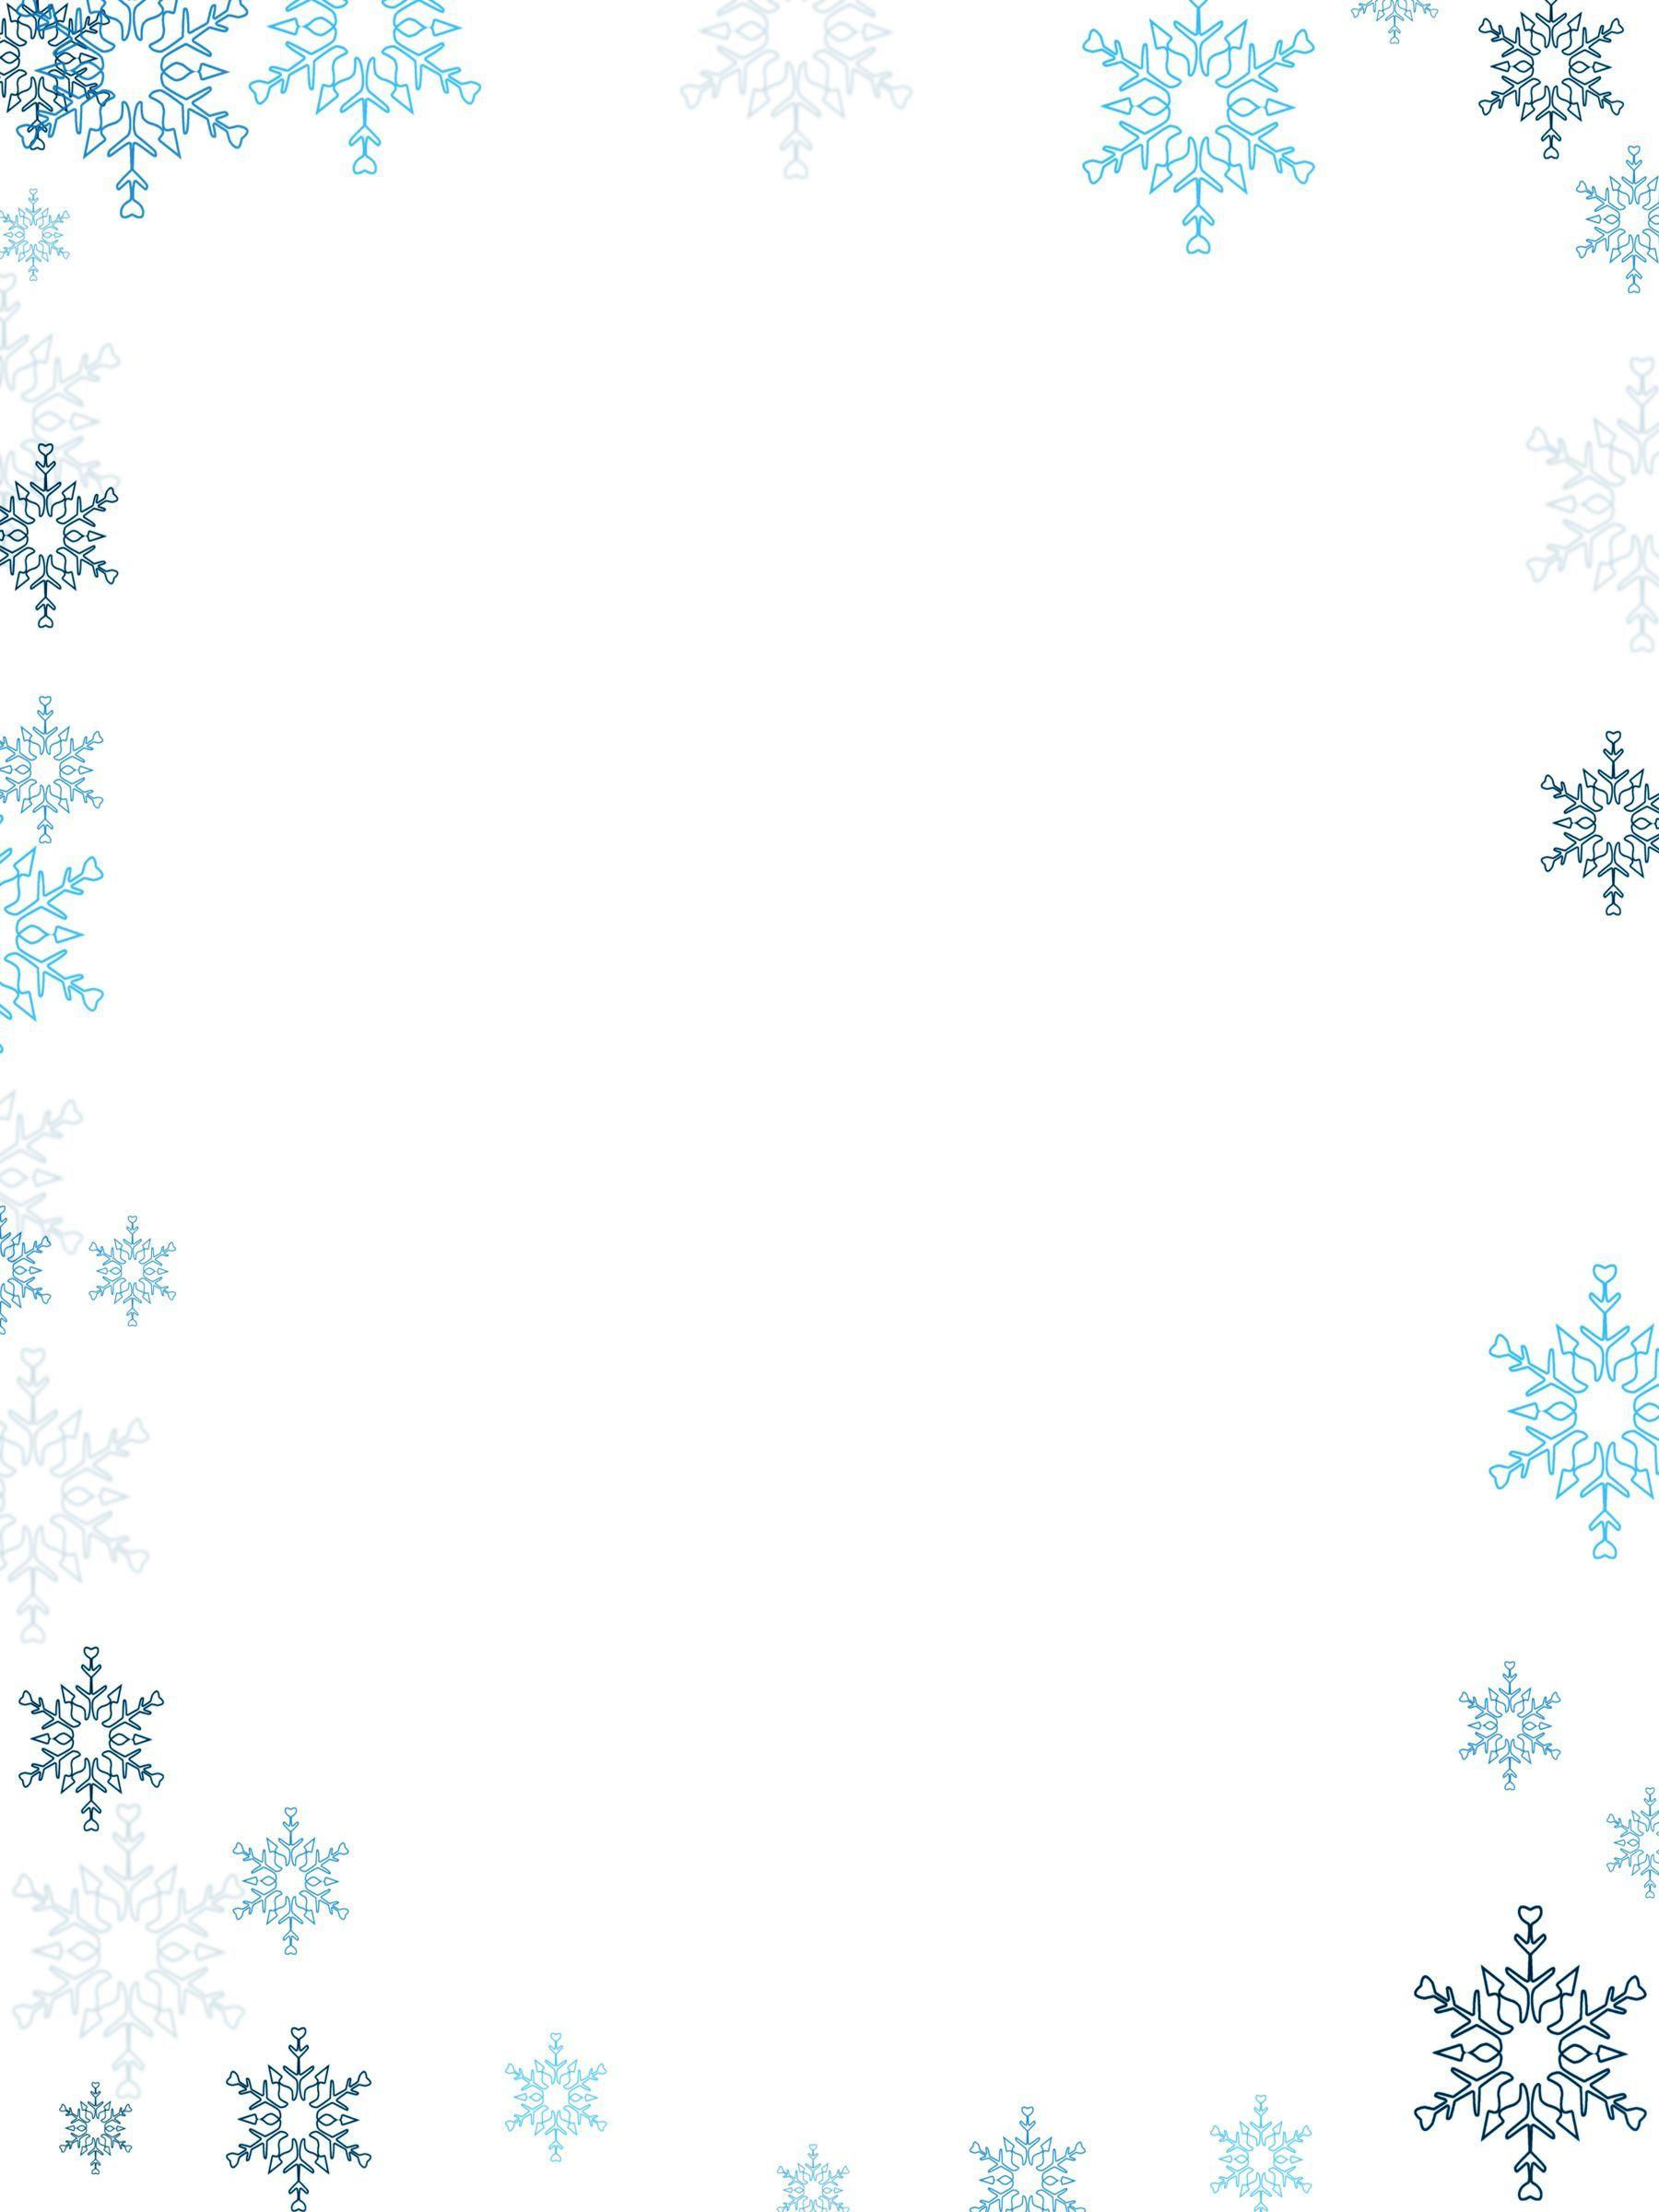 Snow borders clipart 7 » Clipart Portal.